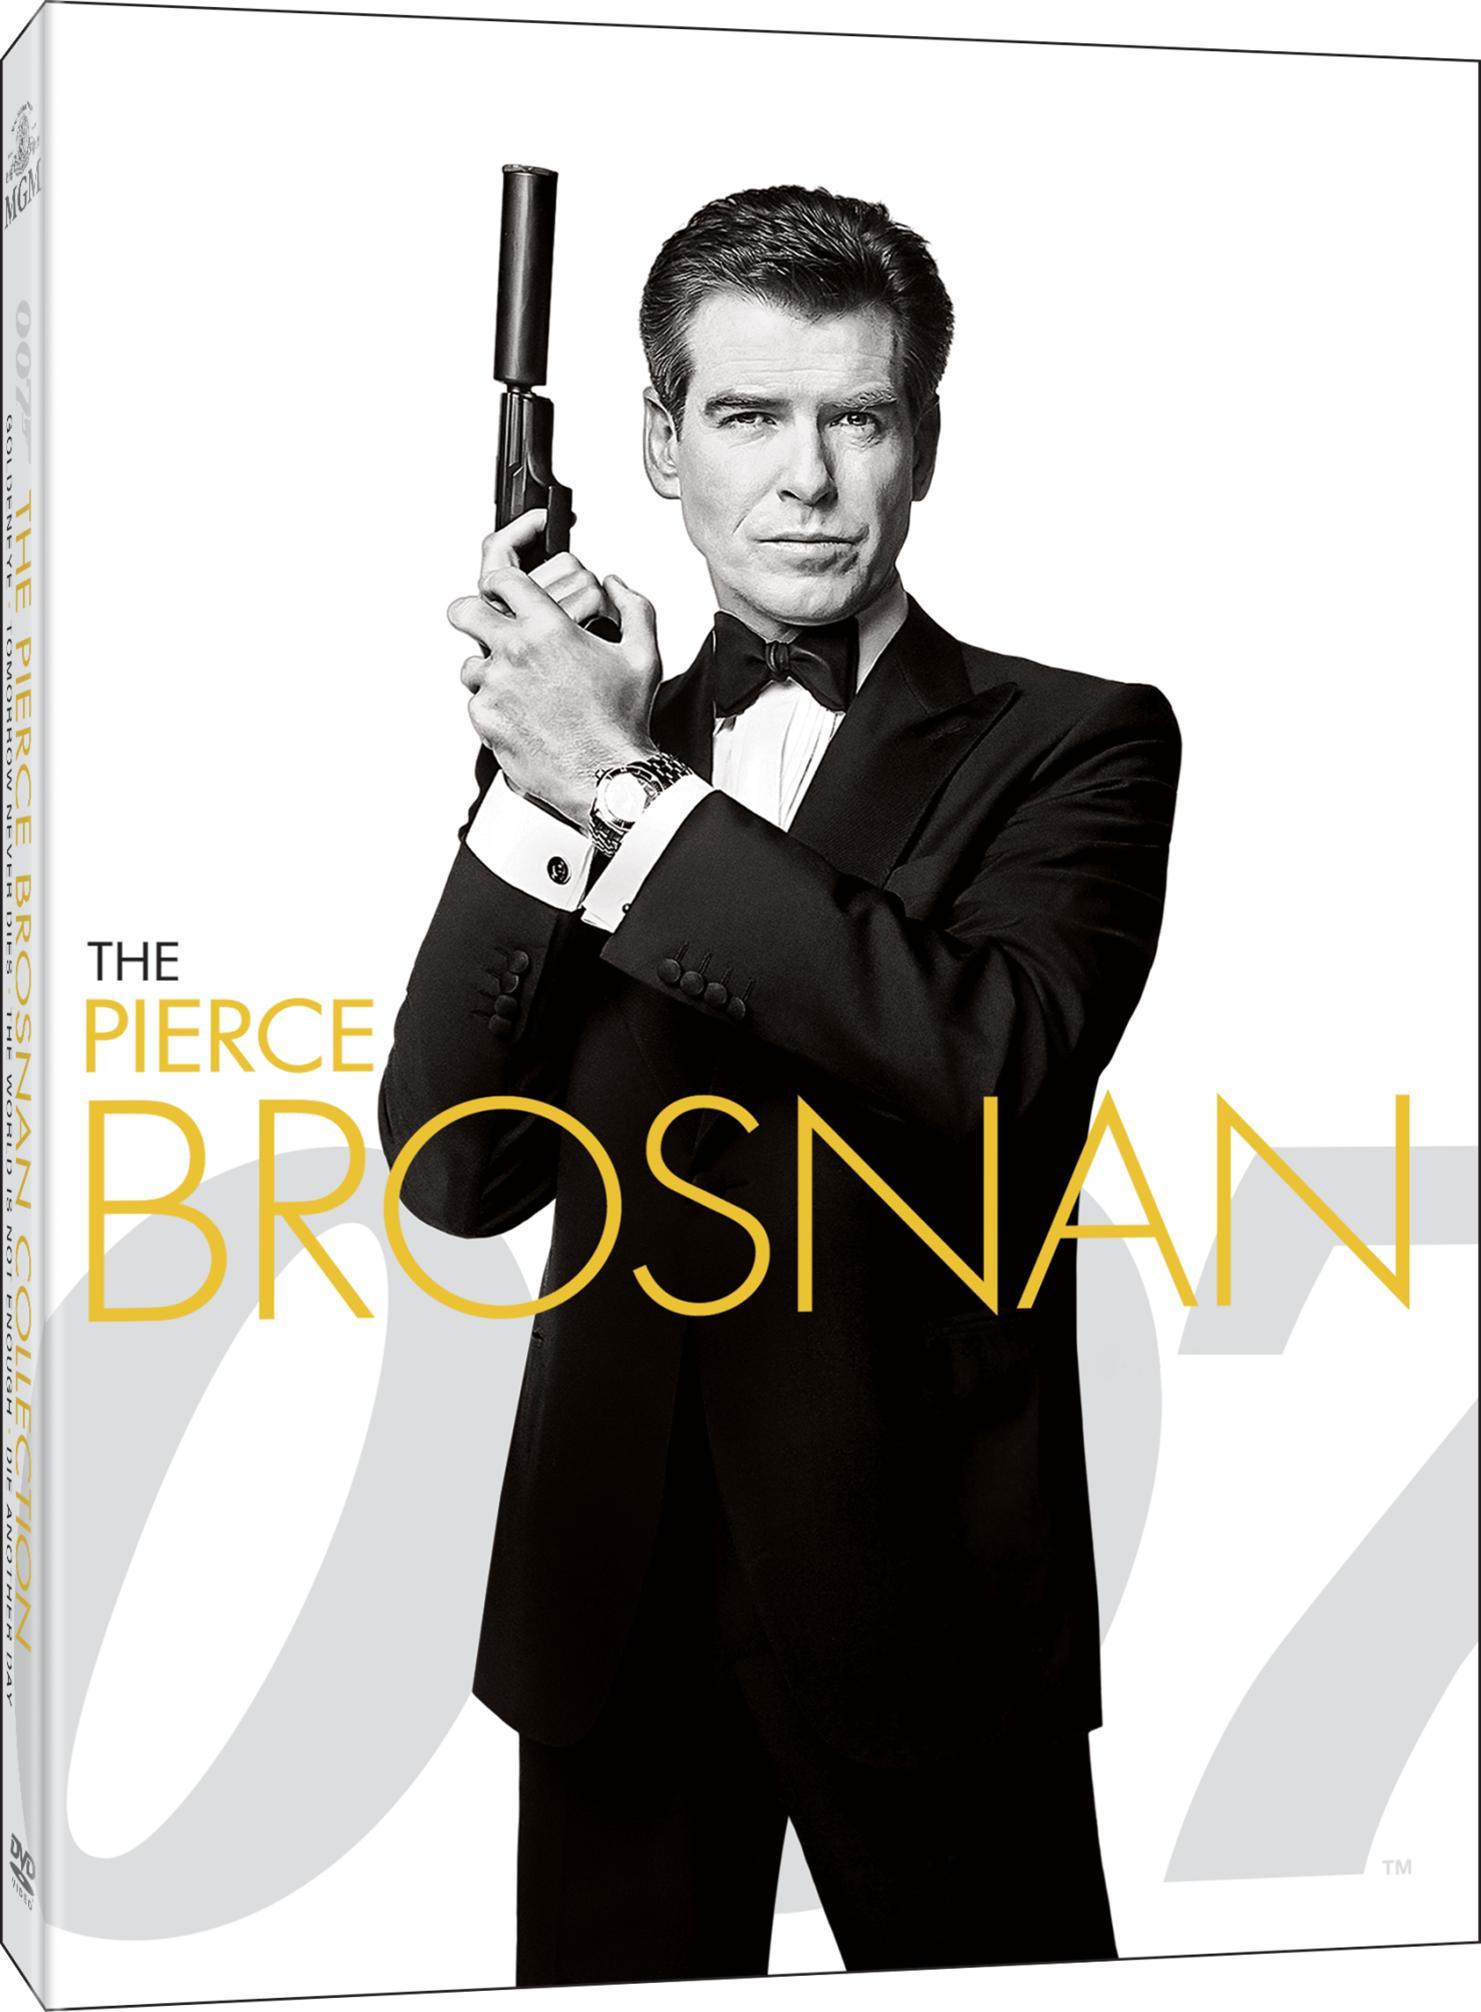 COF.007 JAMES BOND PIERCE BROSNAN COLLECTION (4 DVD) (DVD)